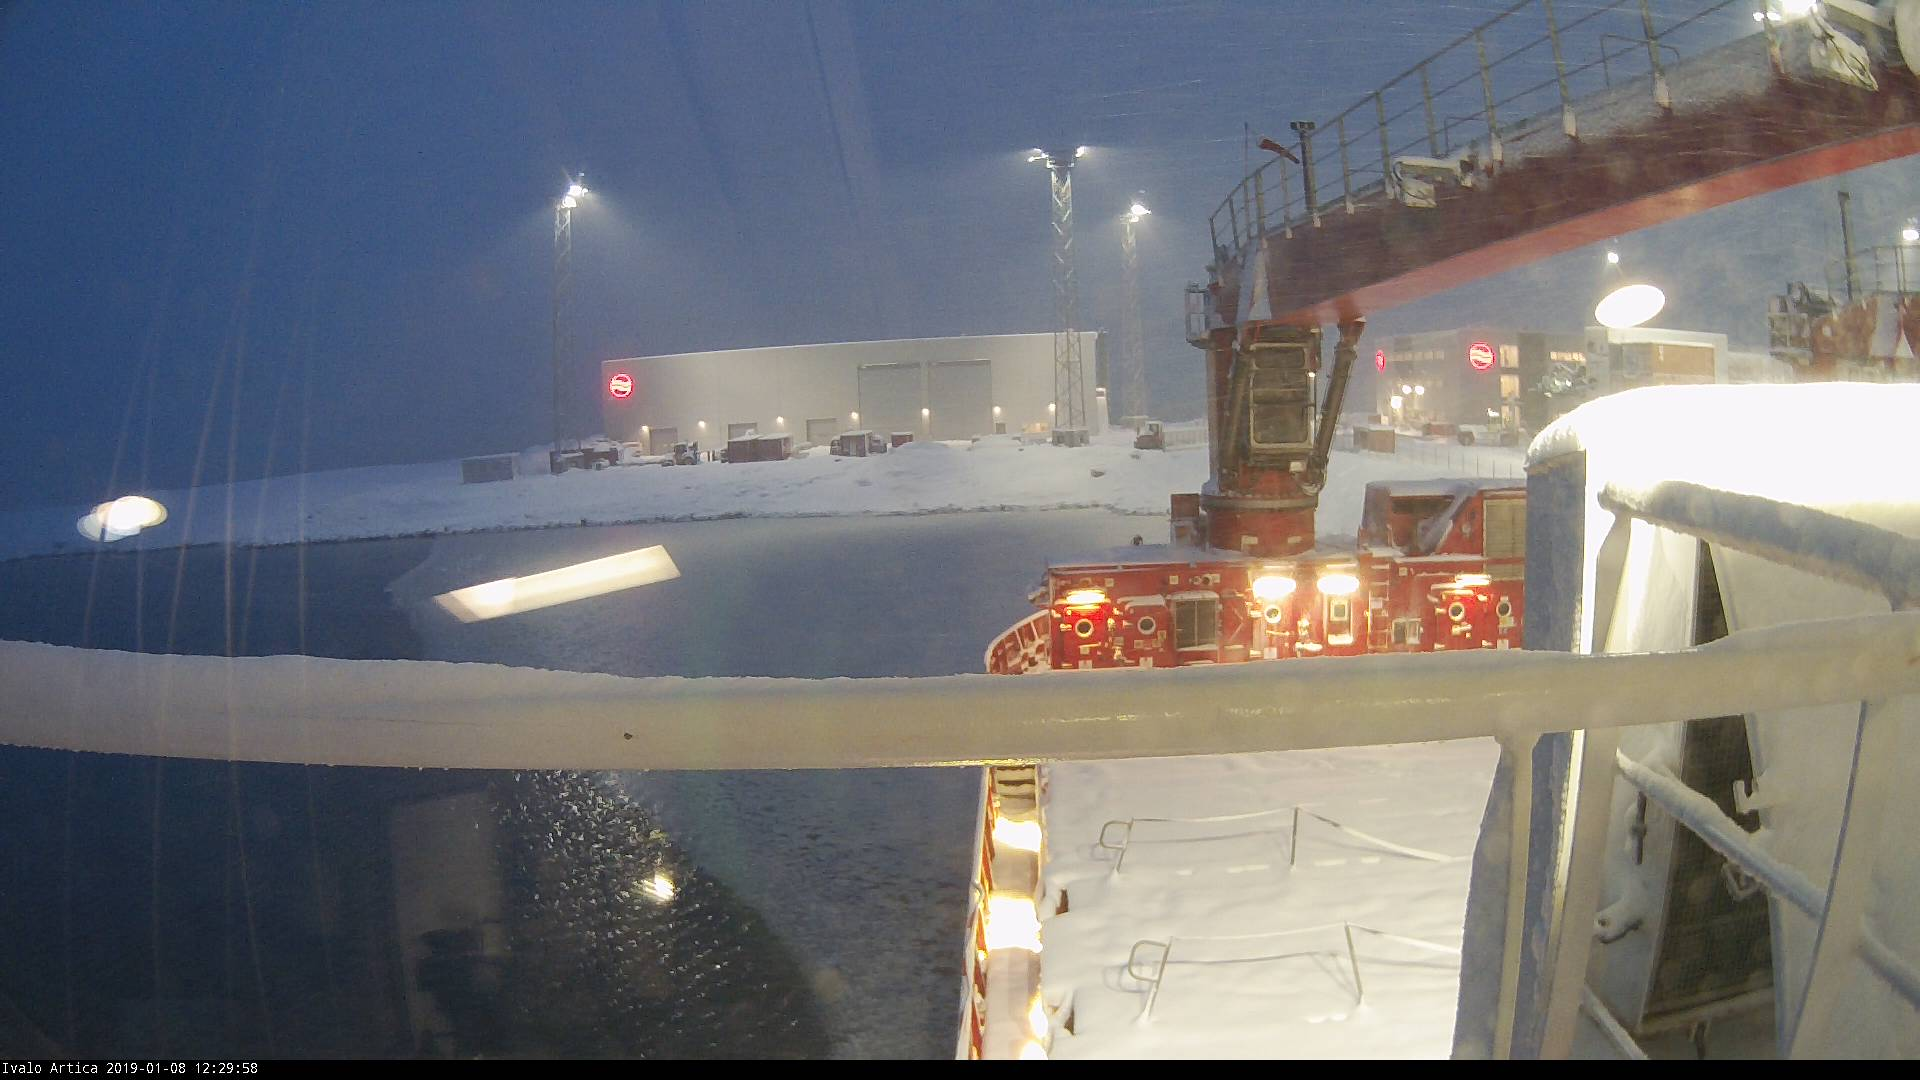 Arctic Line : Webcam ivalo arctica view over the ship